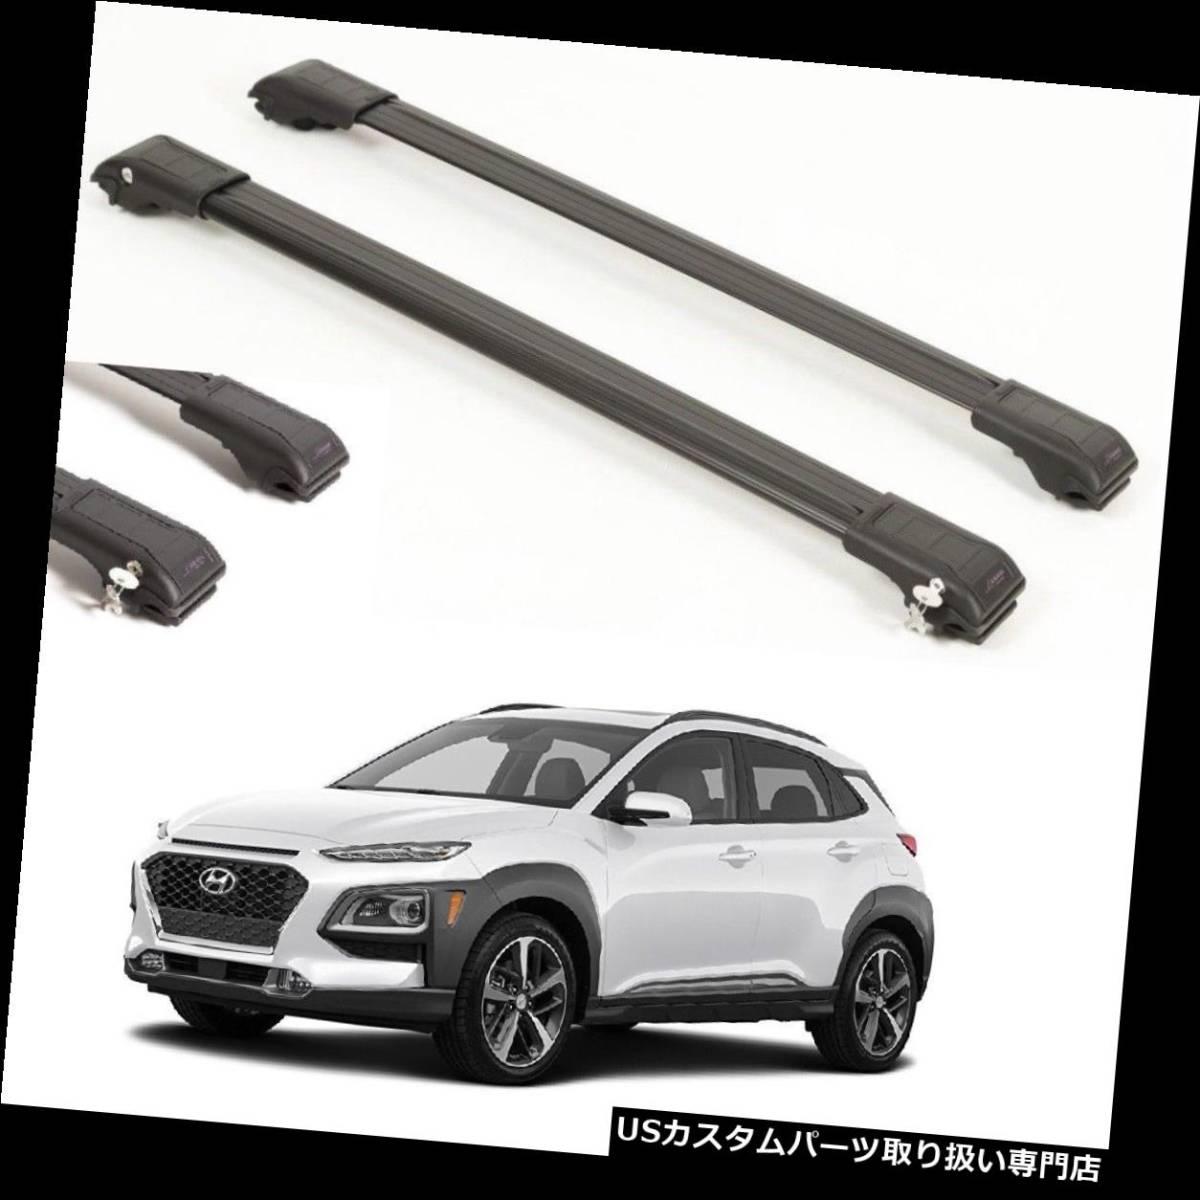 TOP ROOF Rack Cross BAR FIT for Hyundai KONA Black 2017-UP